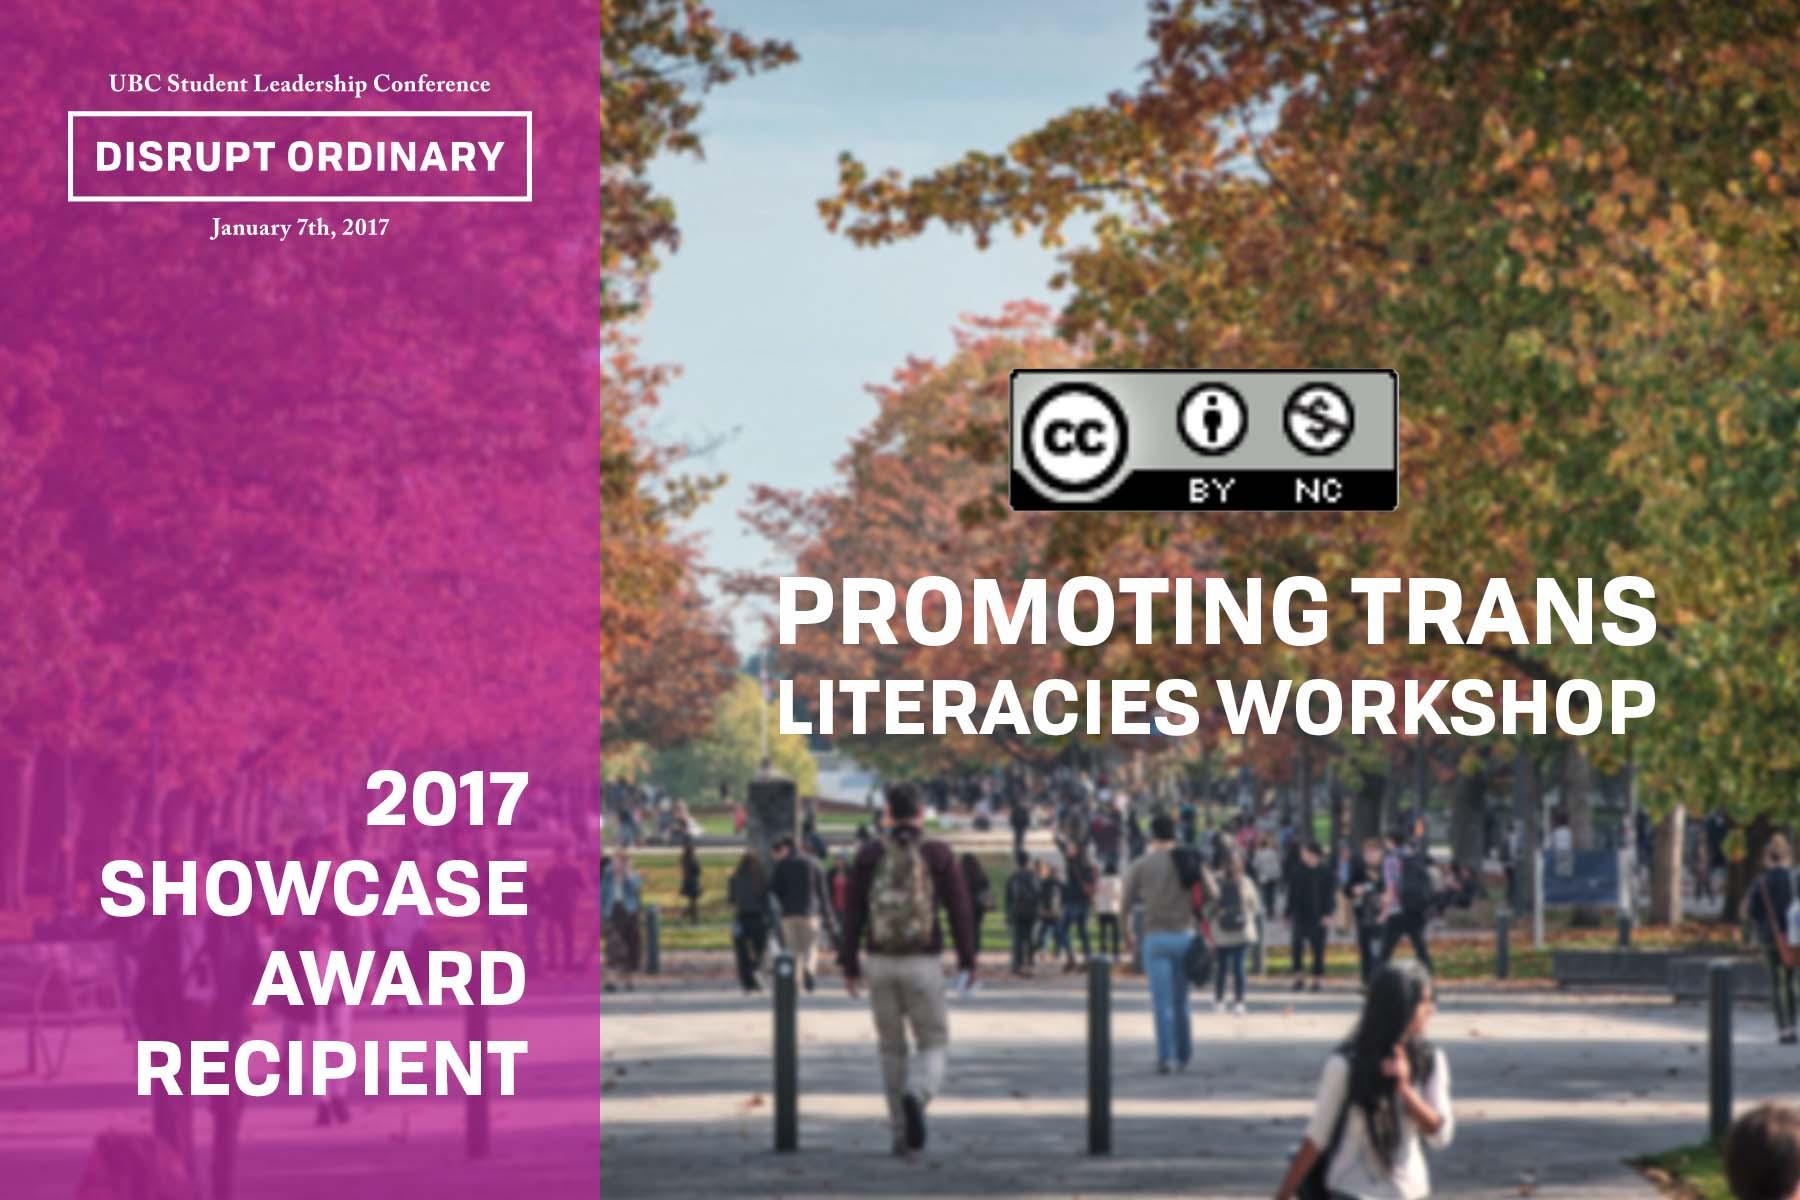 Showcase Award Recipient - Promoting Trans Literacies Workshop